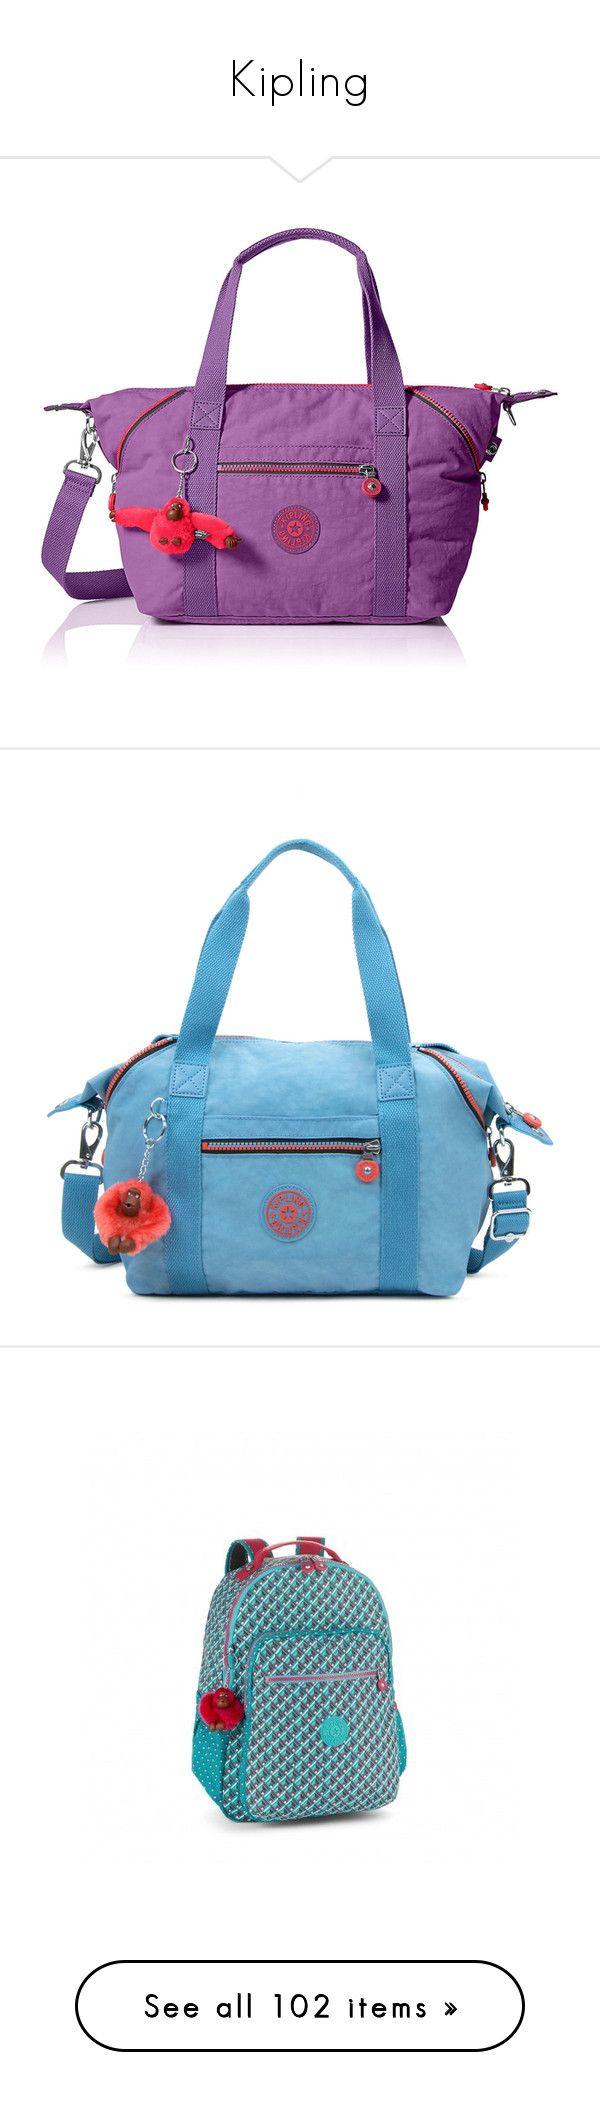 """Kipling"" by lorika-borika ❤ liked on Polyvore featuring bags, handbags, tote bags, purple tote, kipling purses, purple purse, purple tote bags, kipling handbags, blue grey and blue handbags"